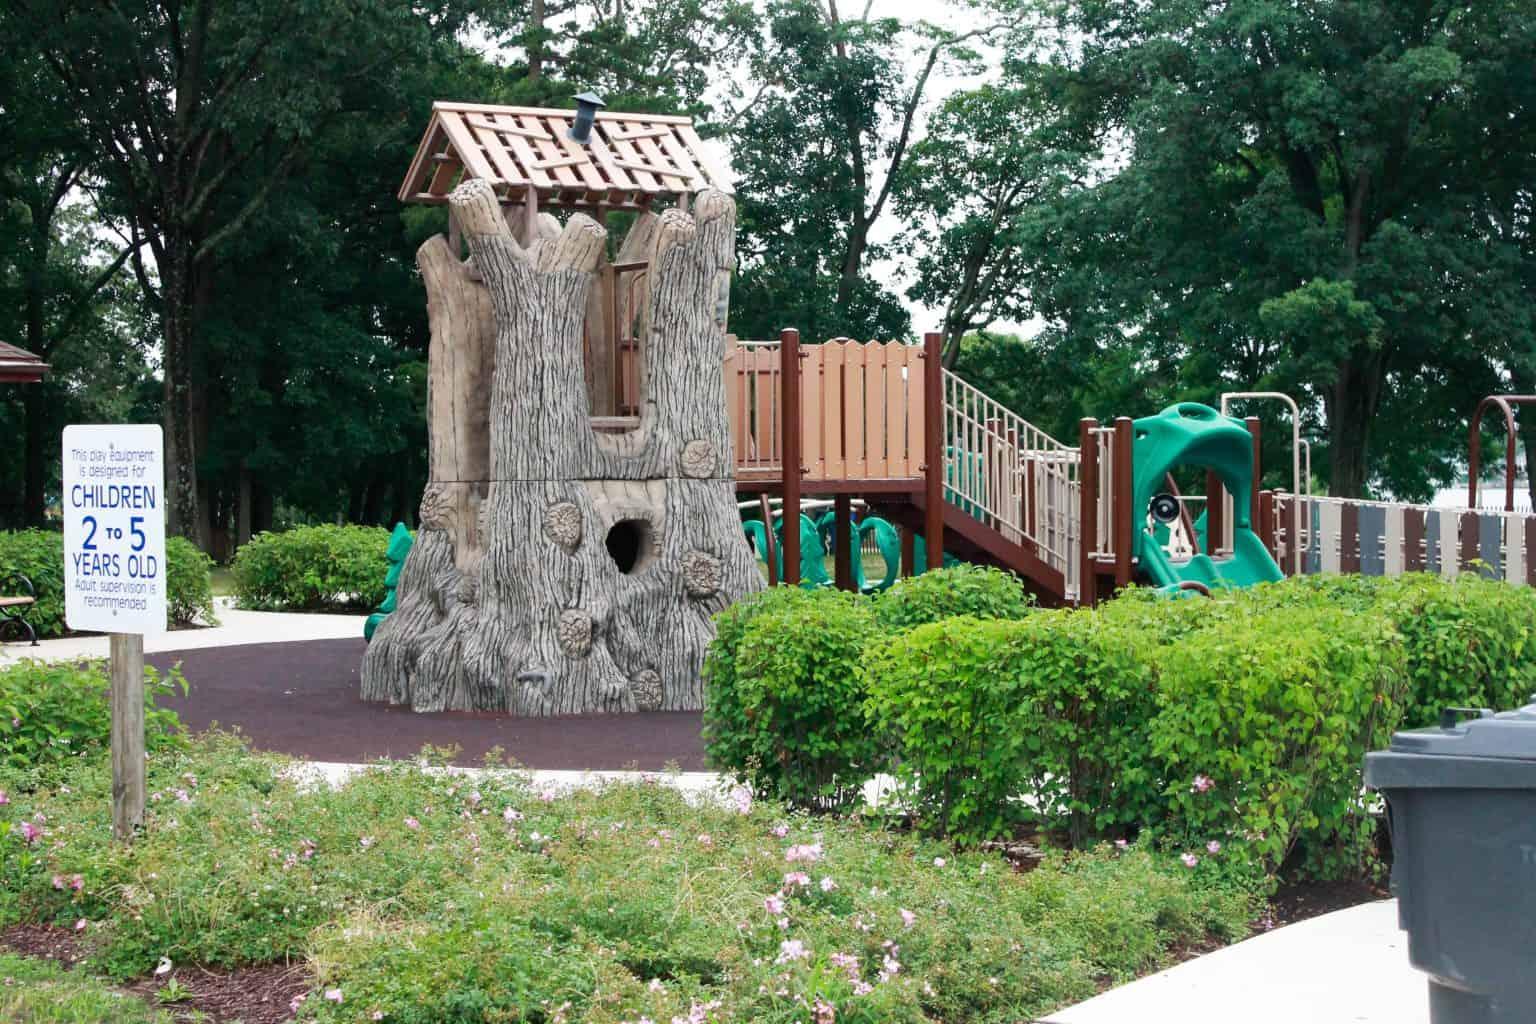 windward-beach-park-playground-brick-nj_27651422773_o-1536x1024